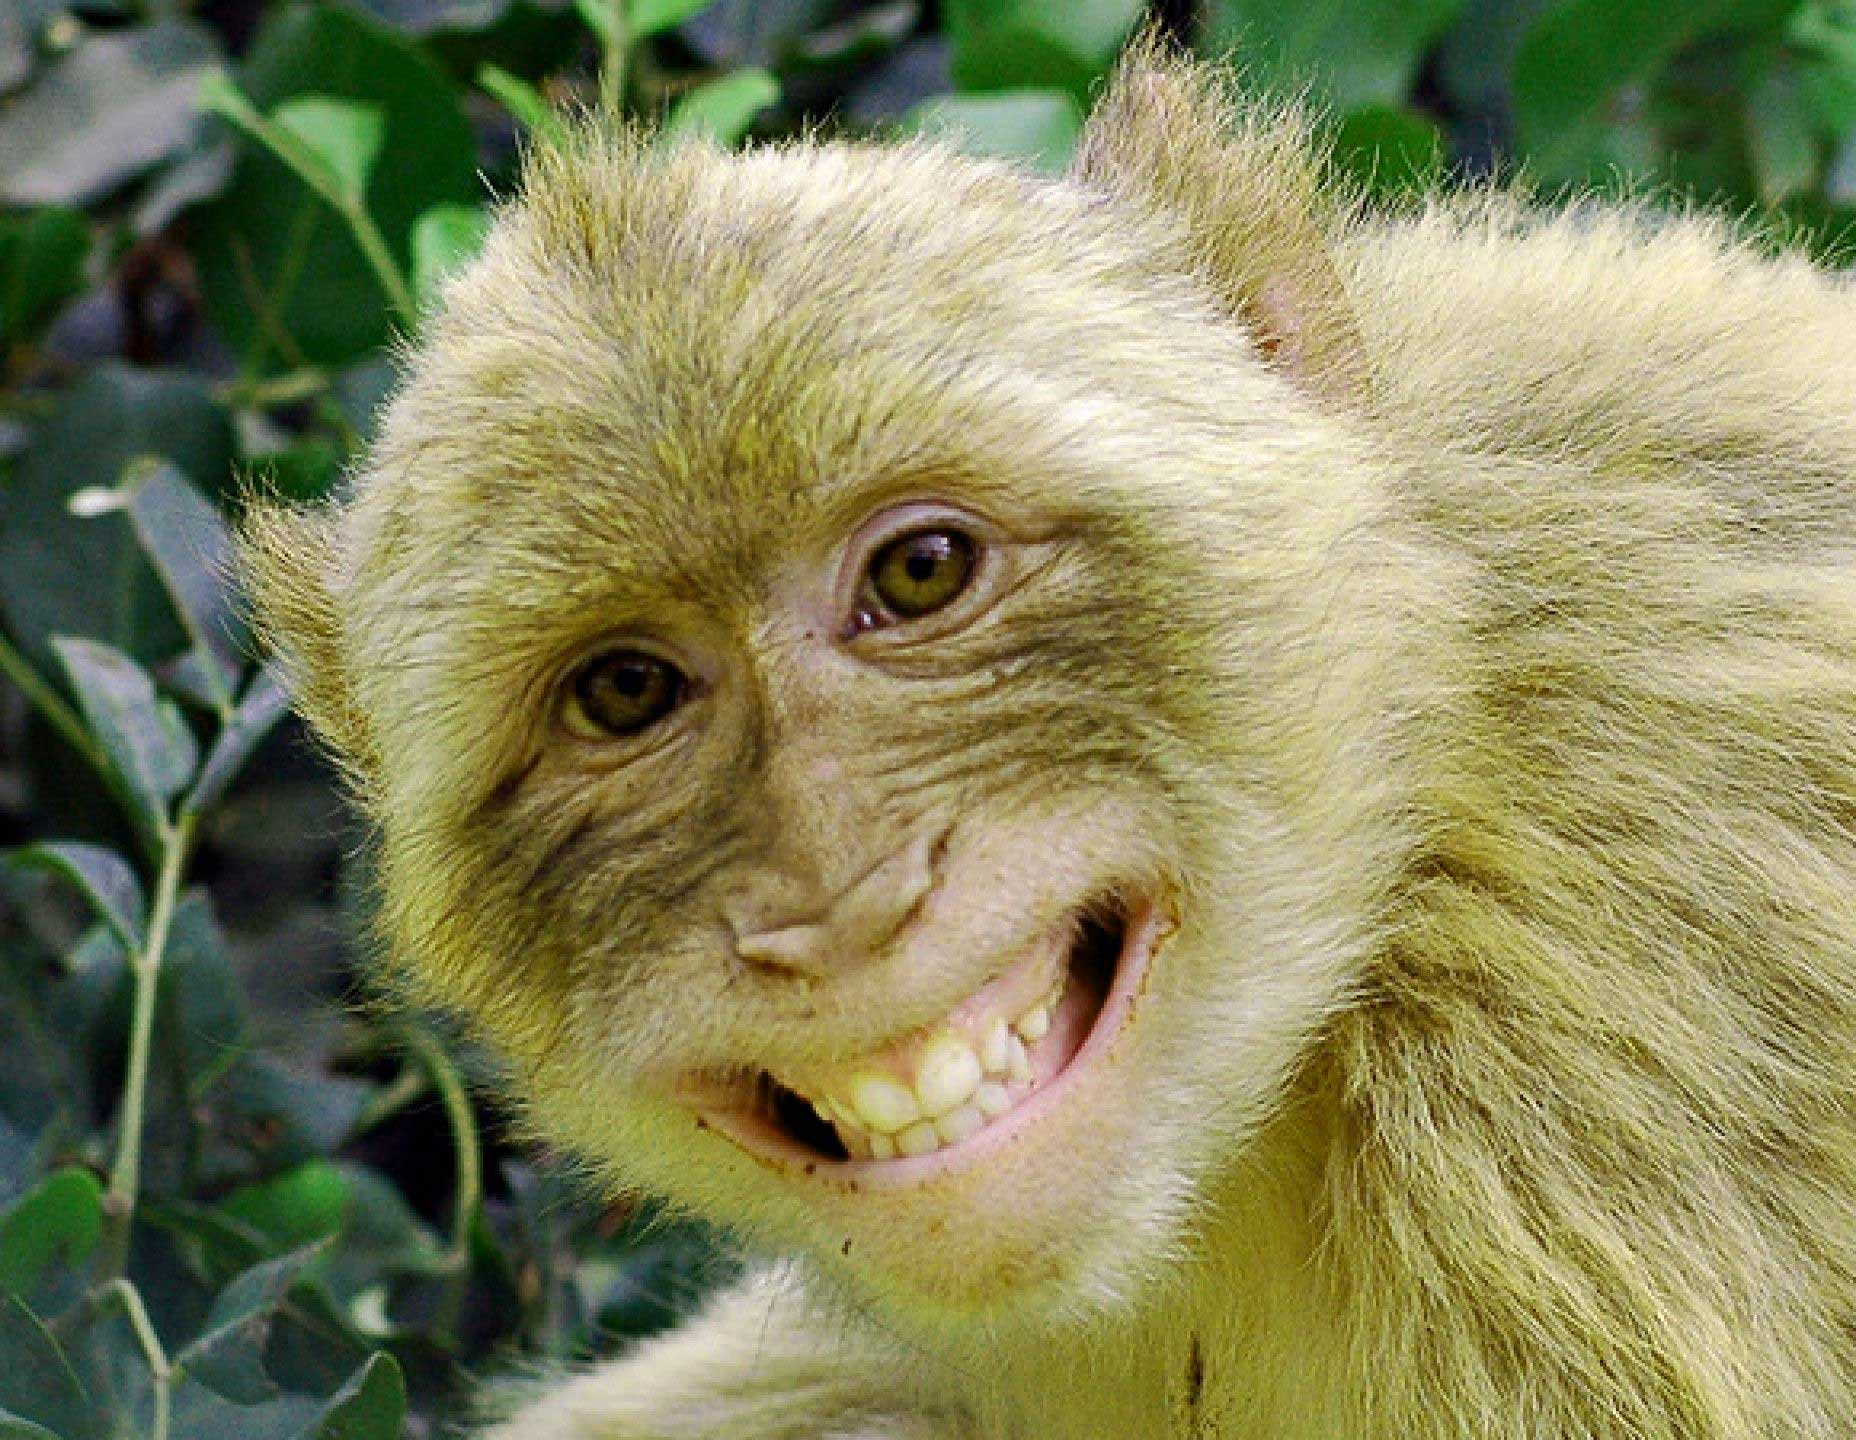 Monkey Latest Funny Whatsapp DP Wallpaper Download